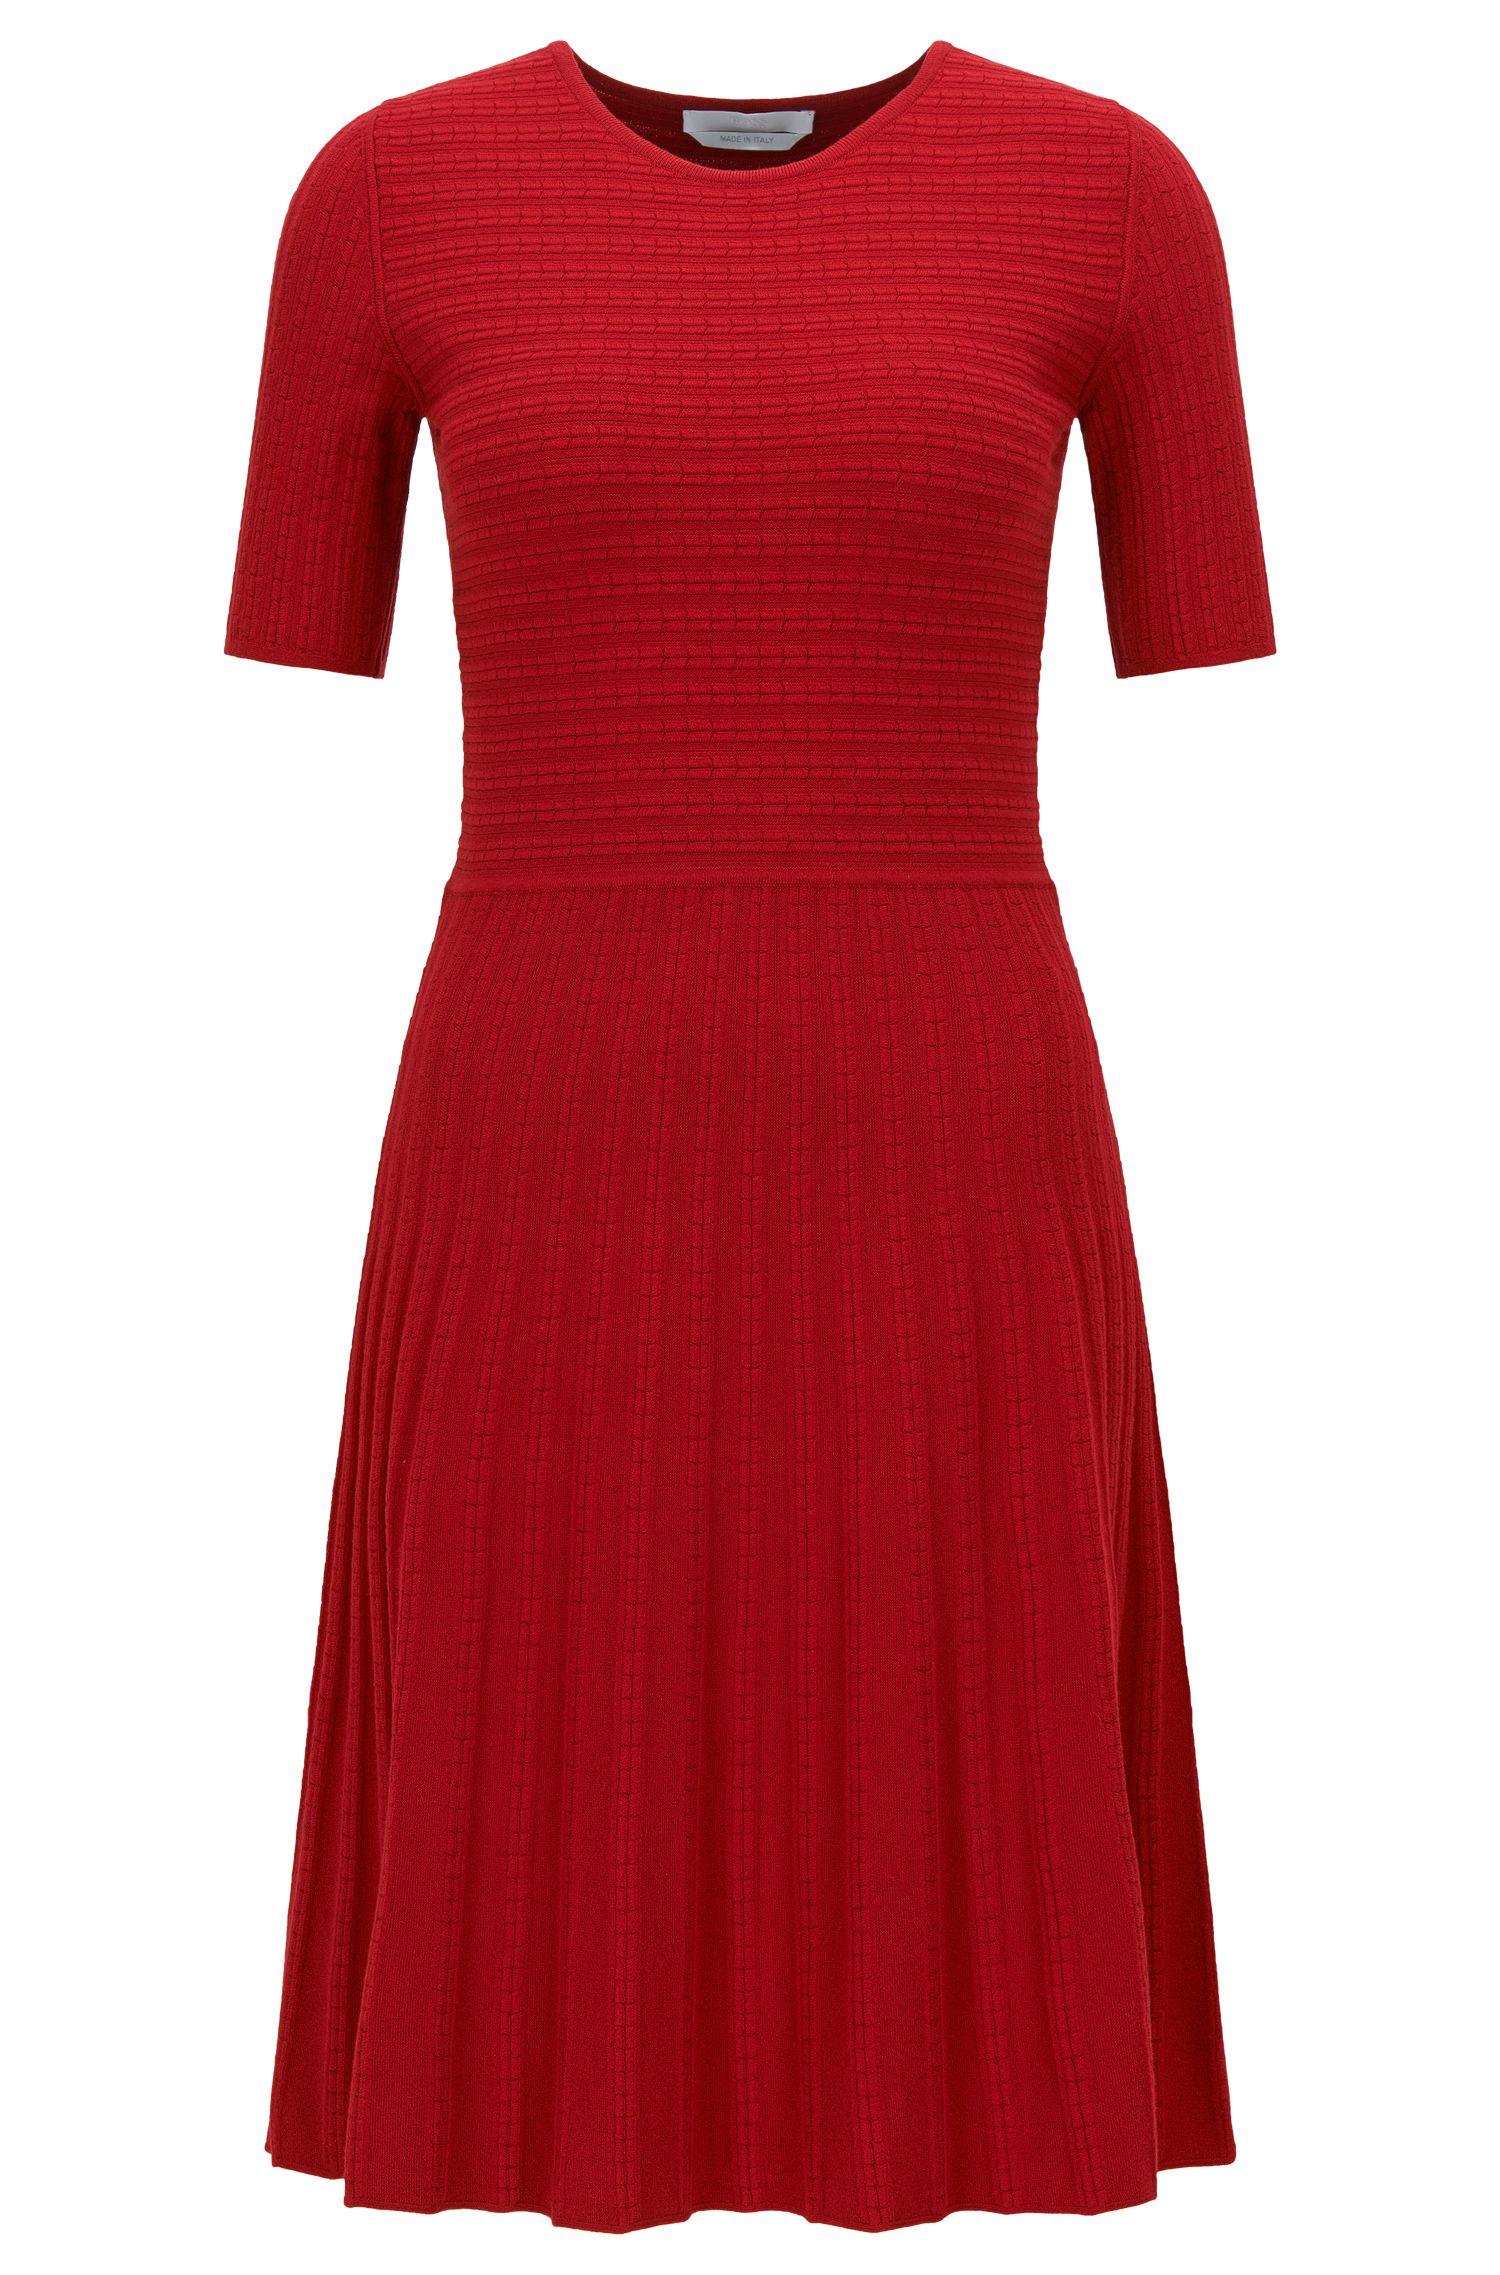 'Frida' | Italian Stretch Dress